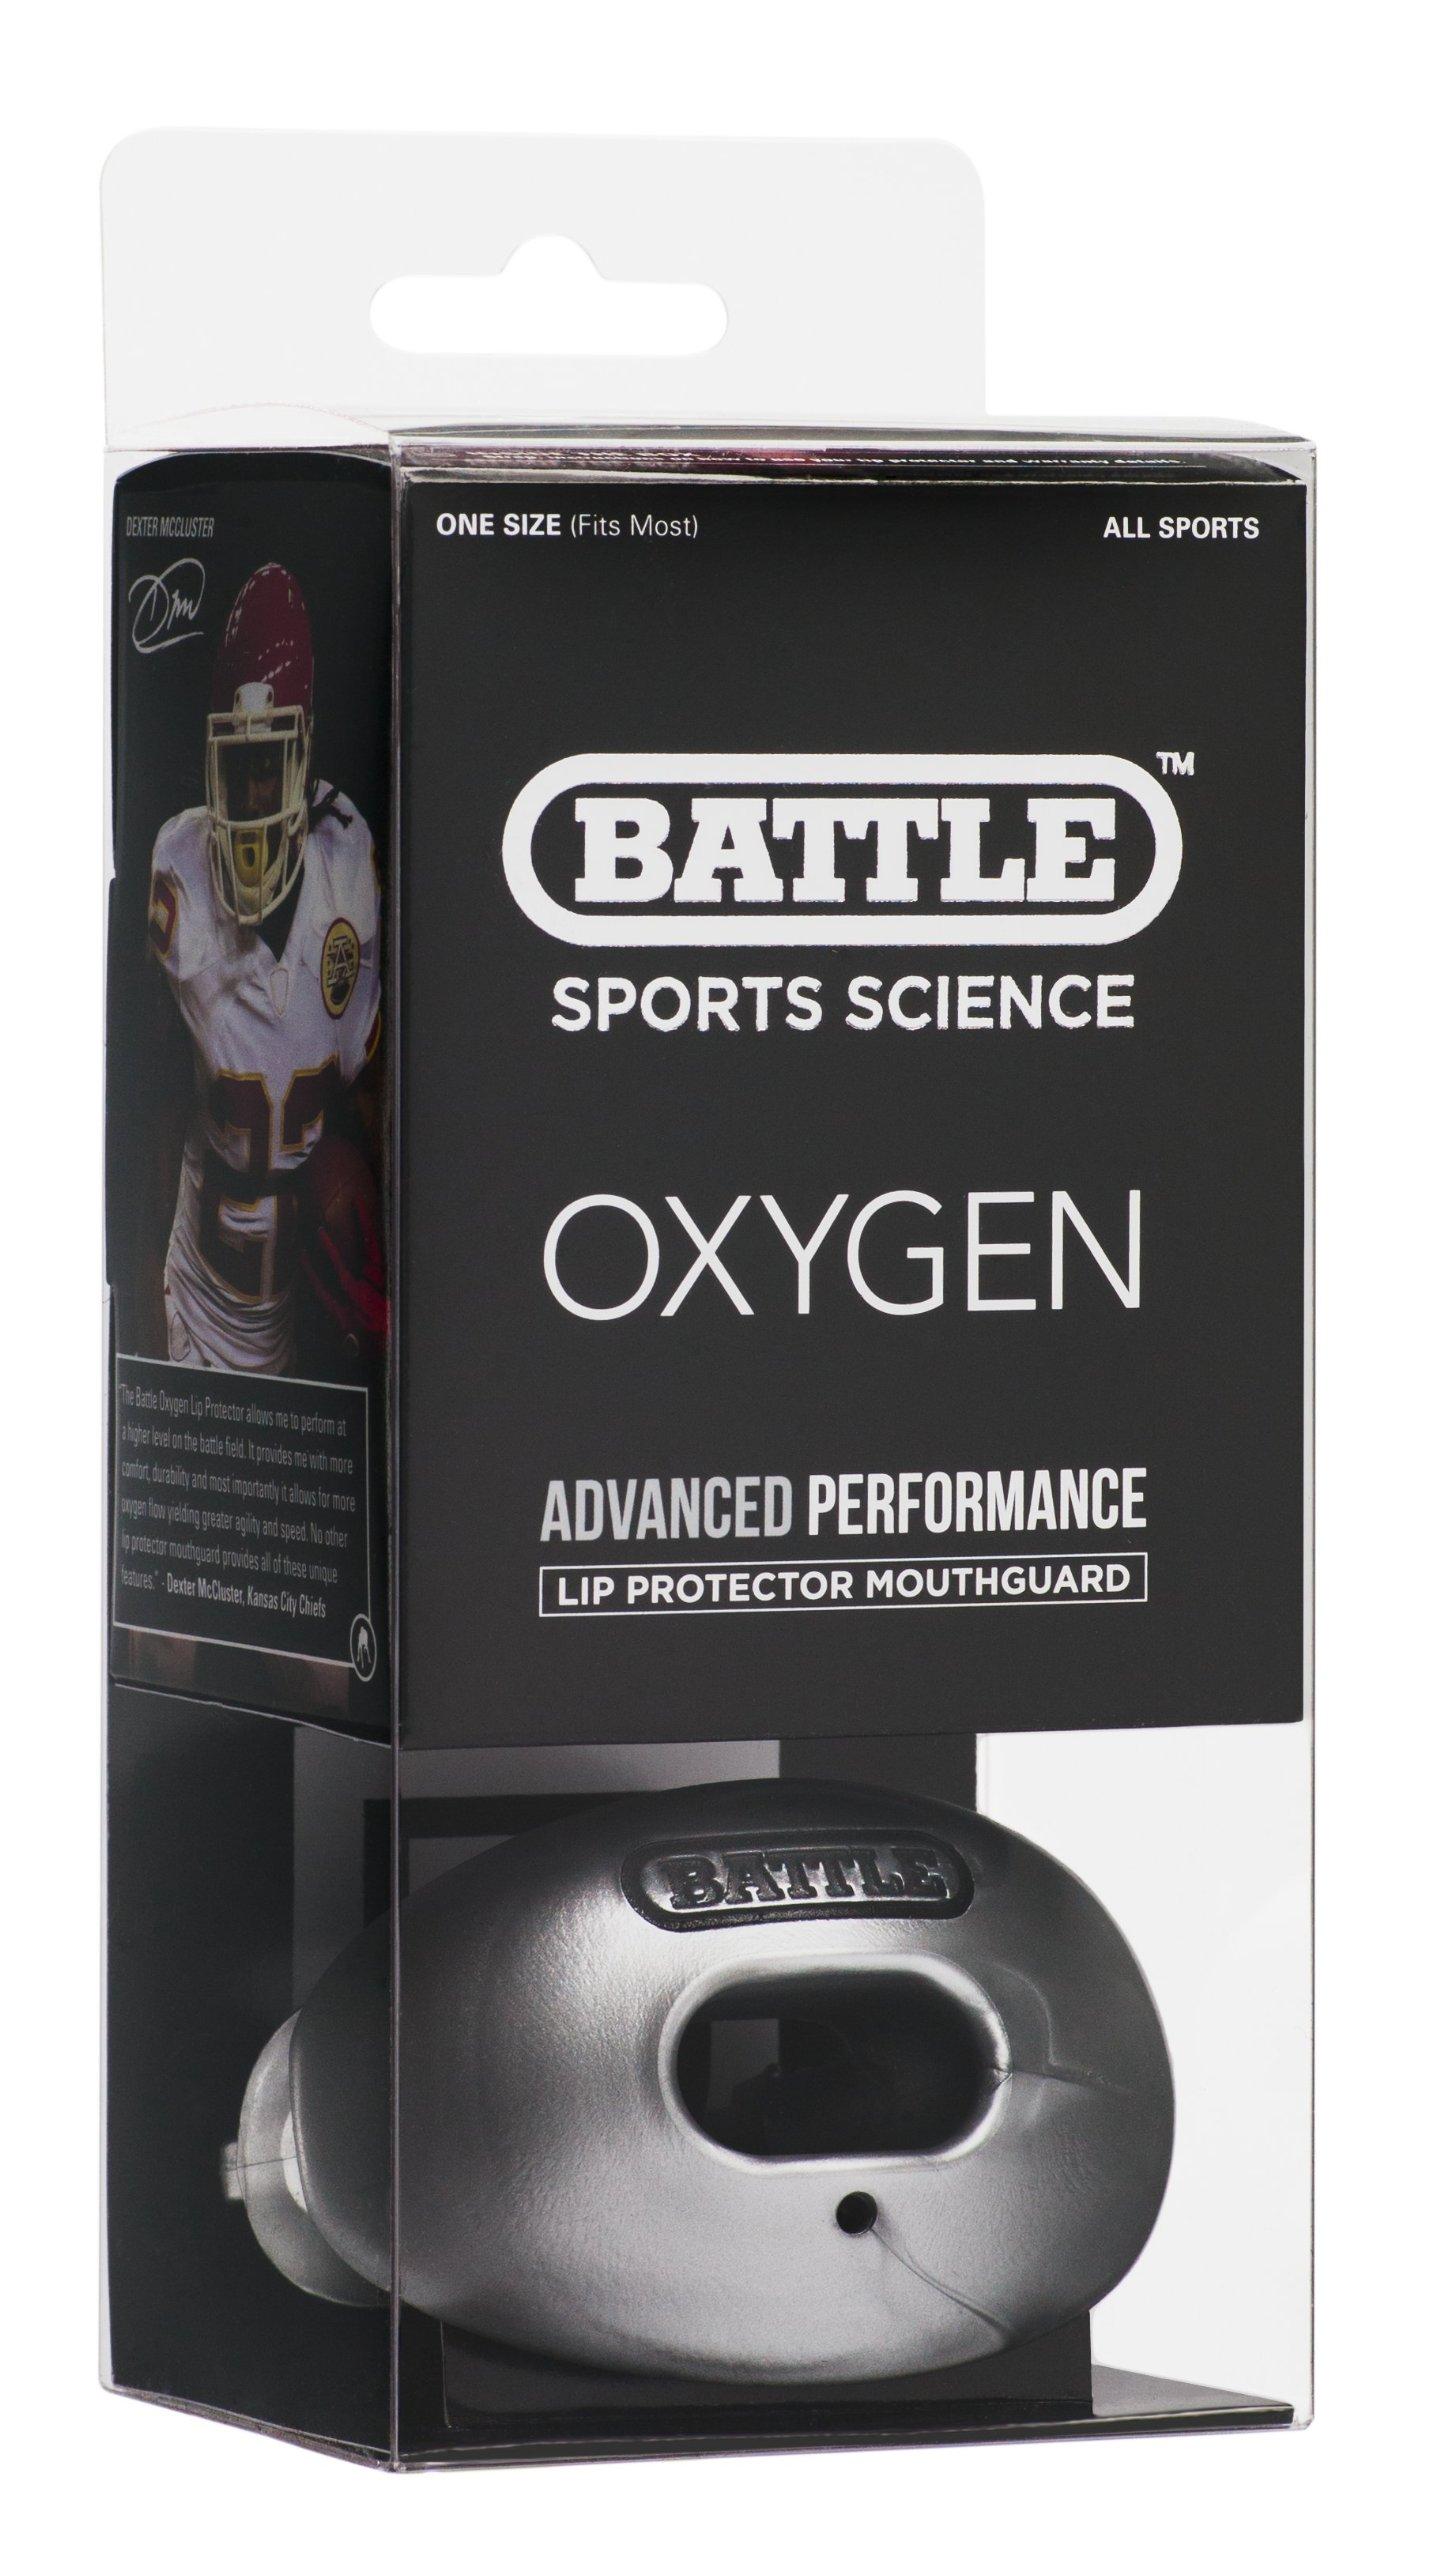 Battle Oxygen Lip Protector Mouthguard, Silver by Battle